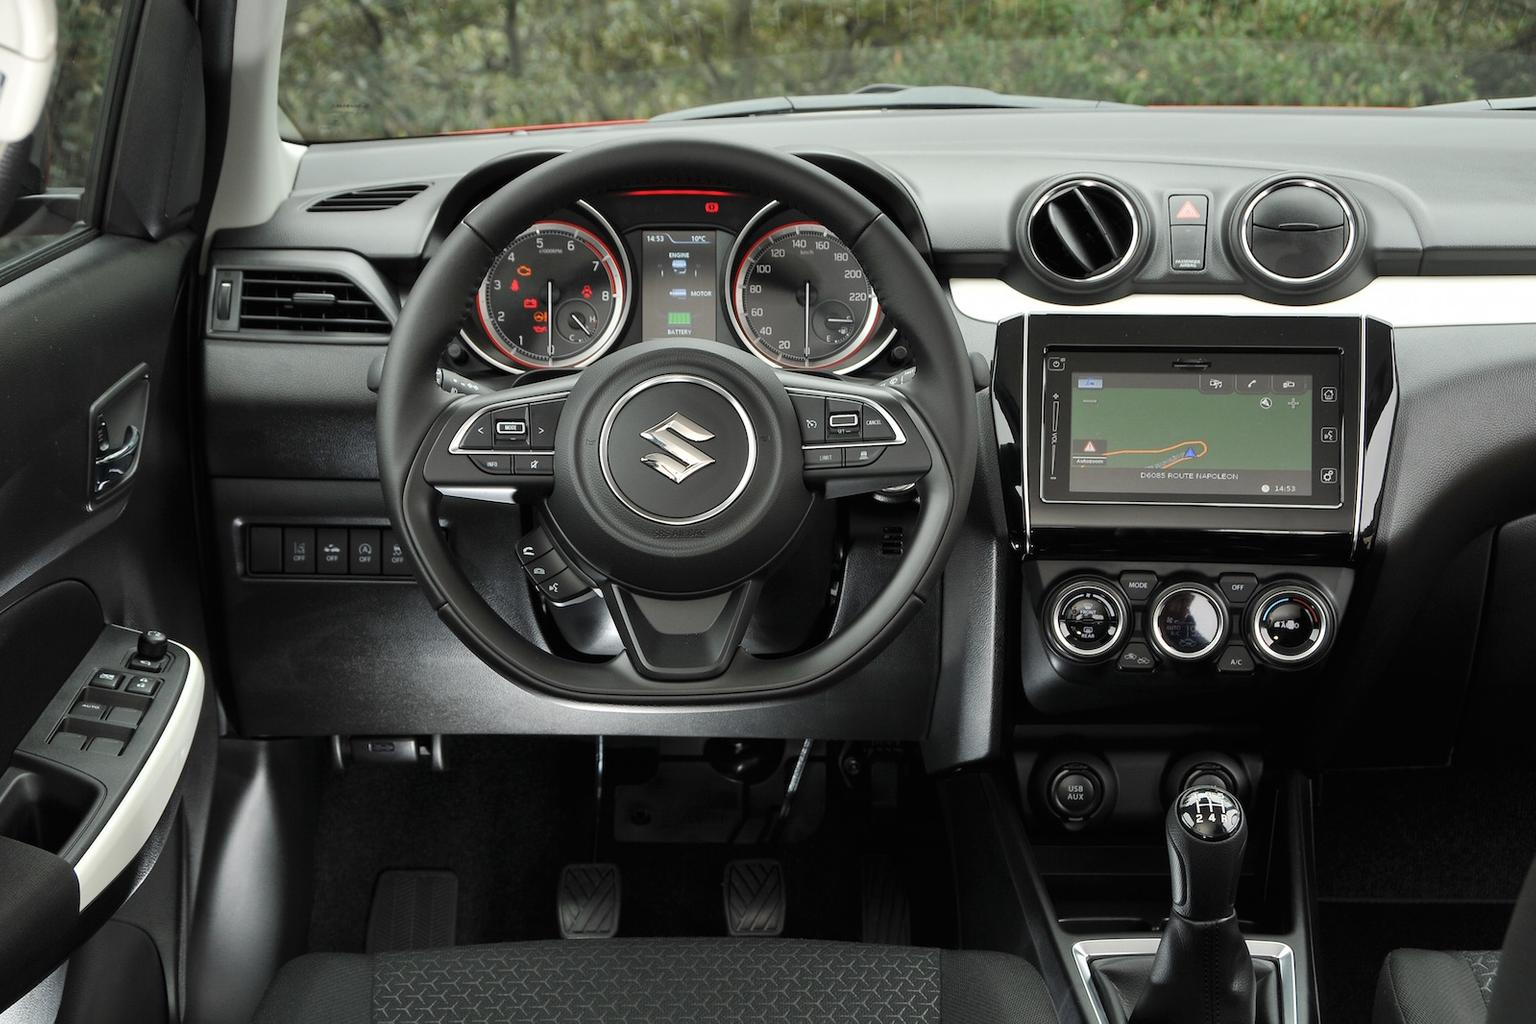 New Suzuki Swift 2017 review